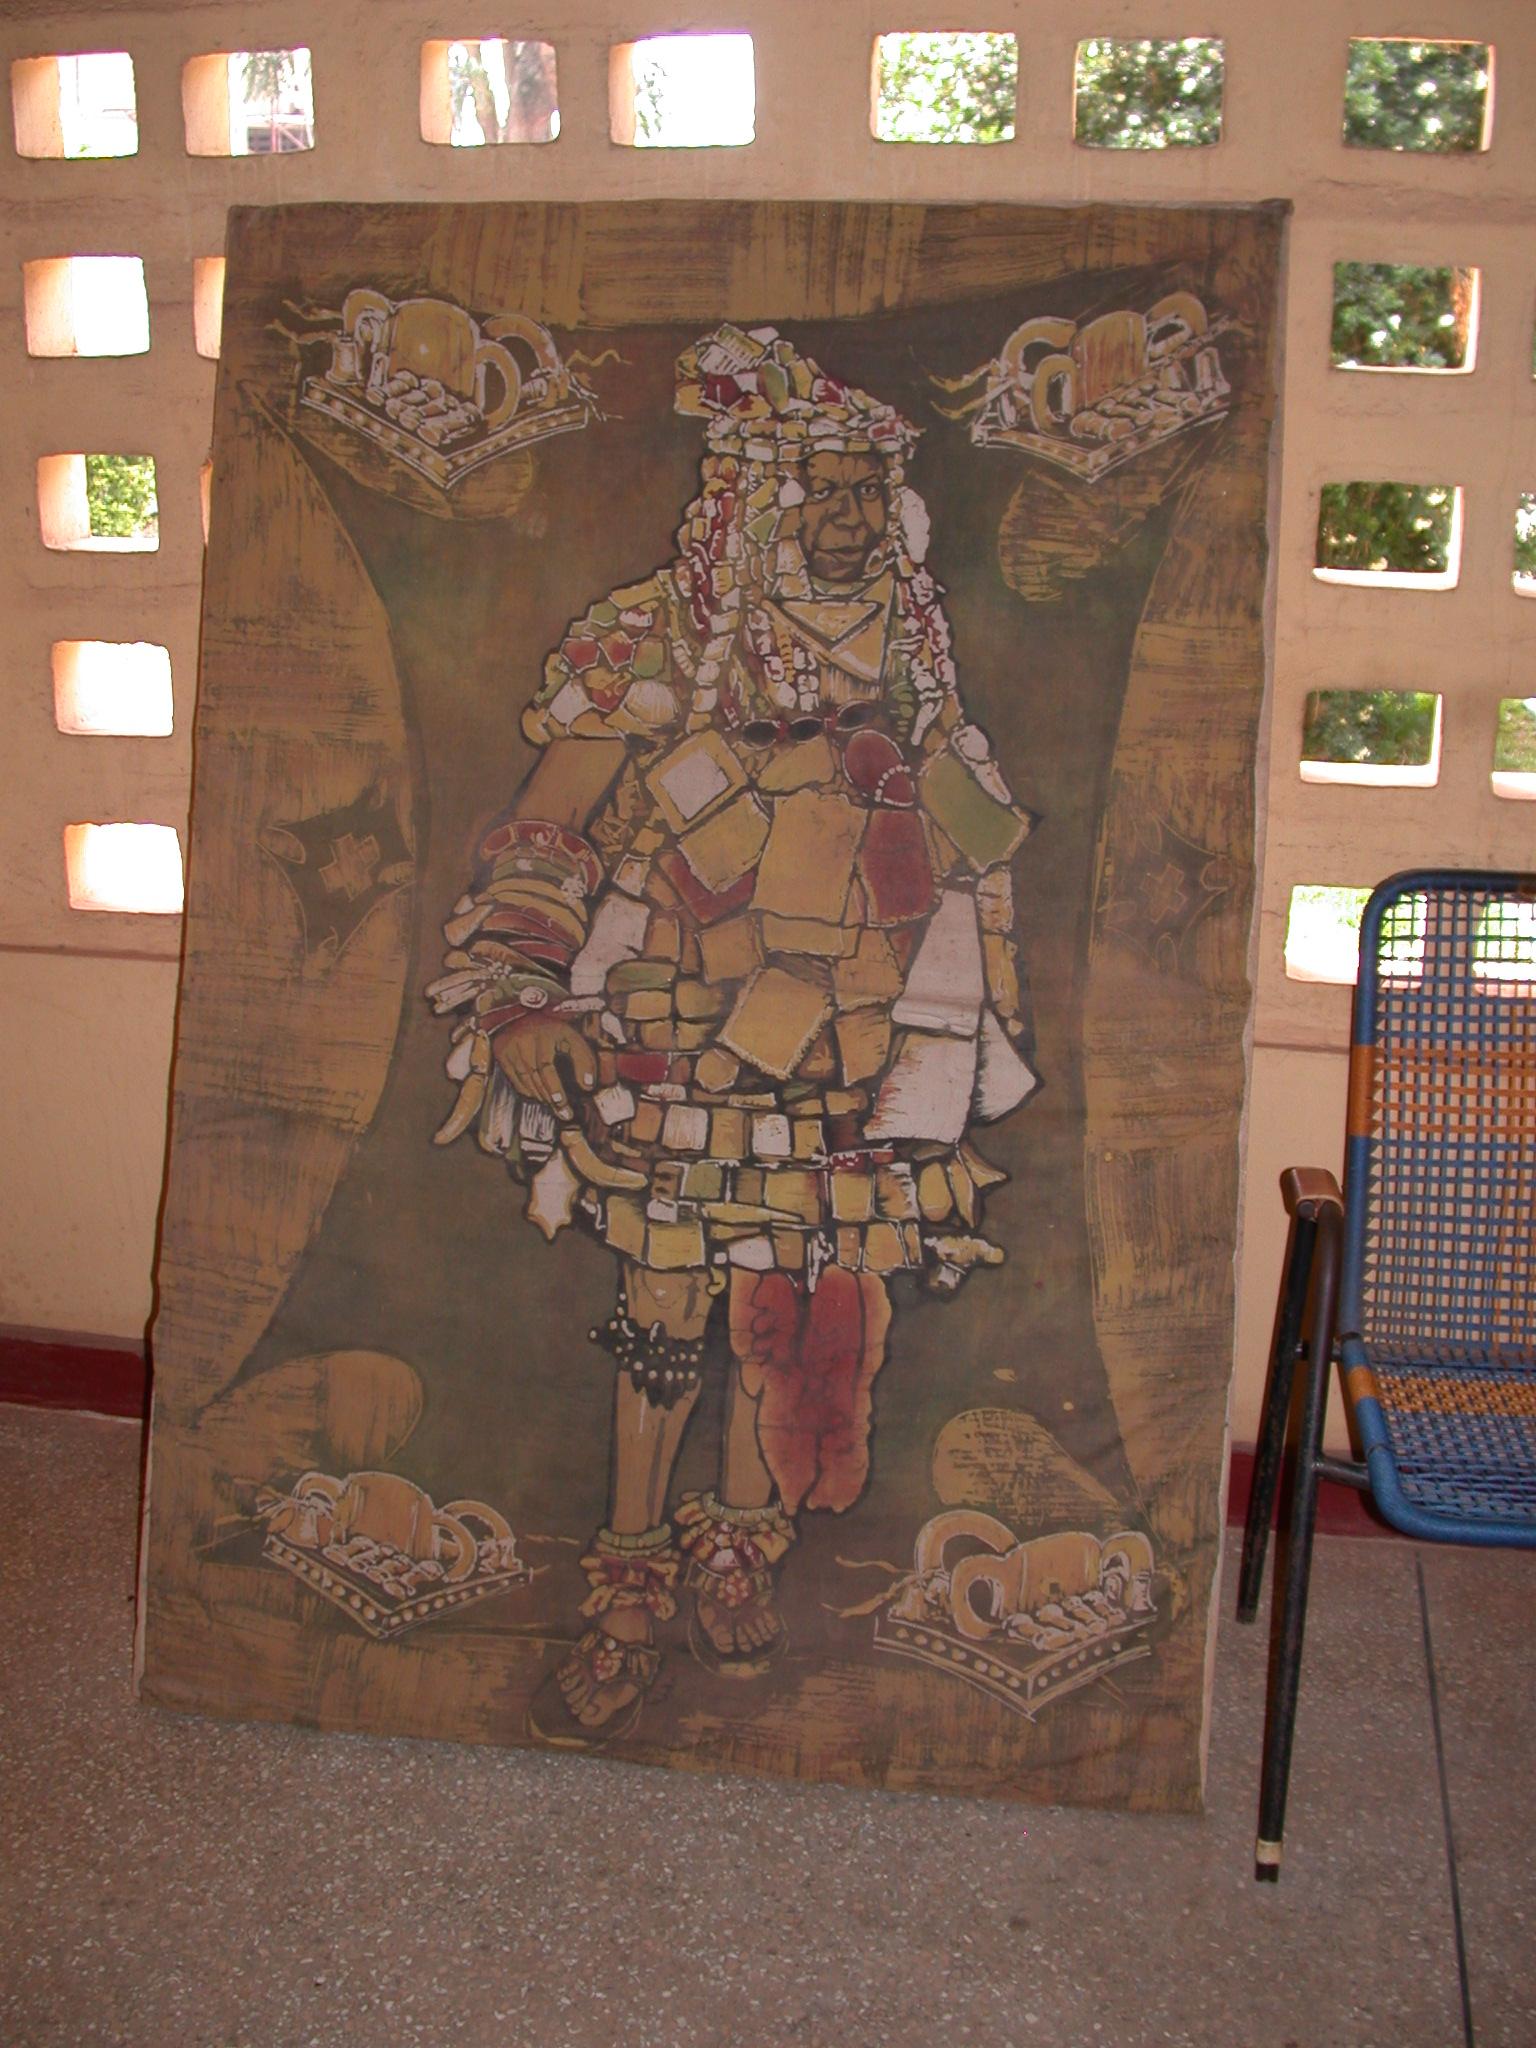 Painting of Asante King Wearing Magical Garb, Okomfo Anokye Sword Site, Kumasi, Ghana